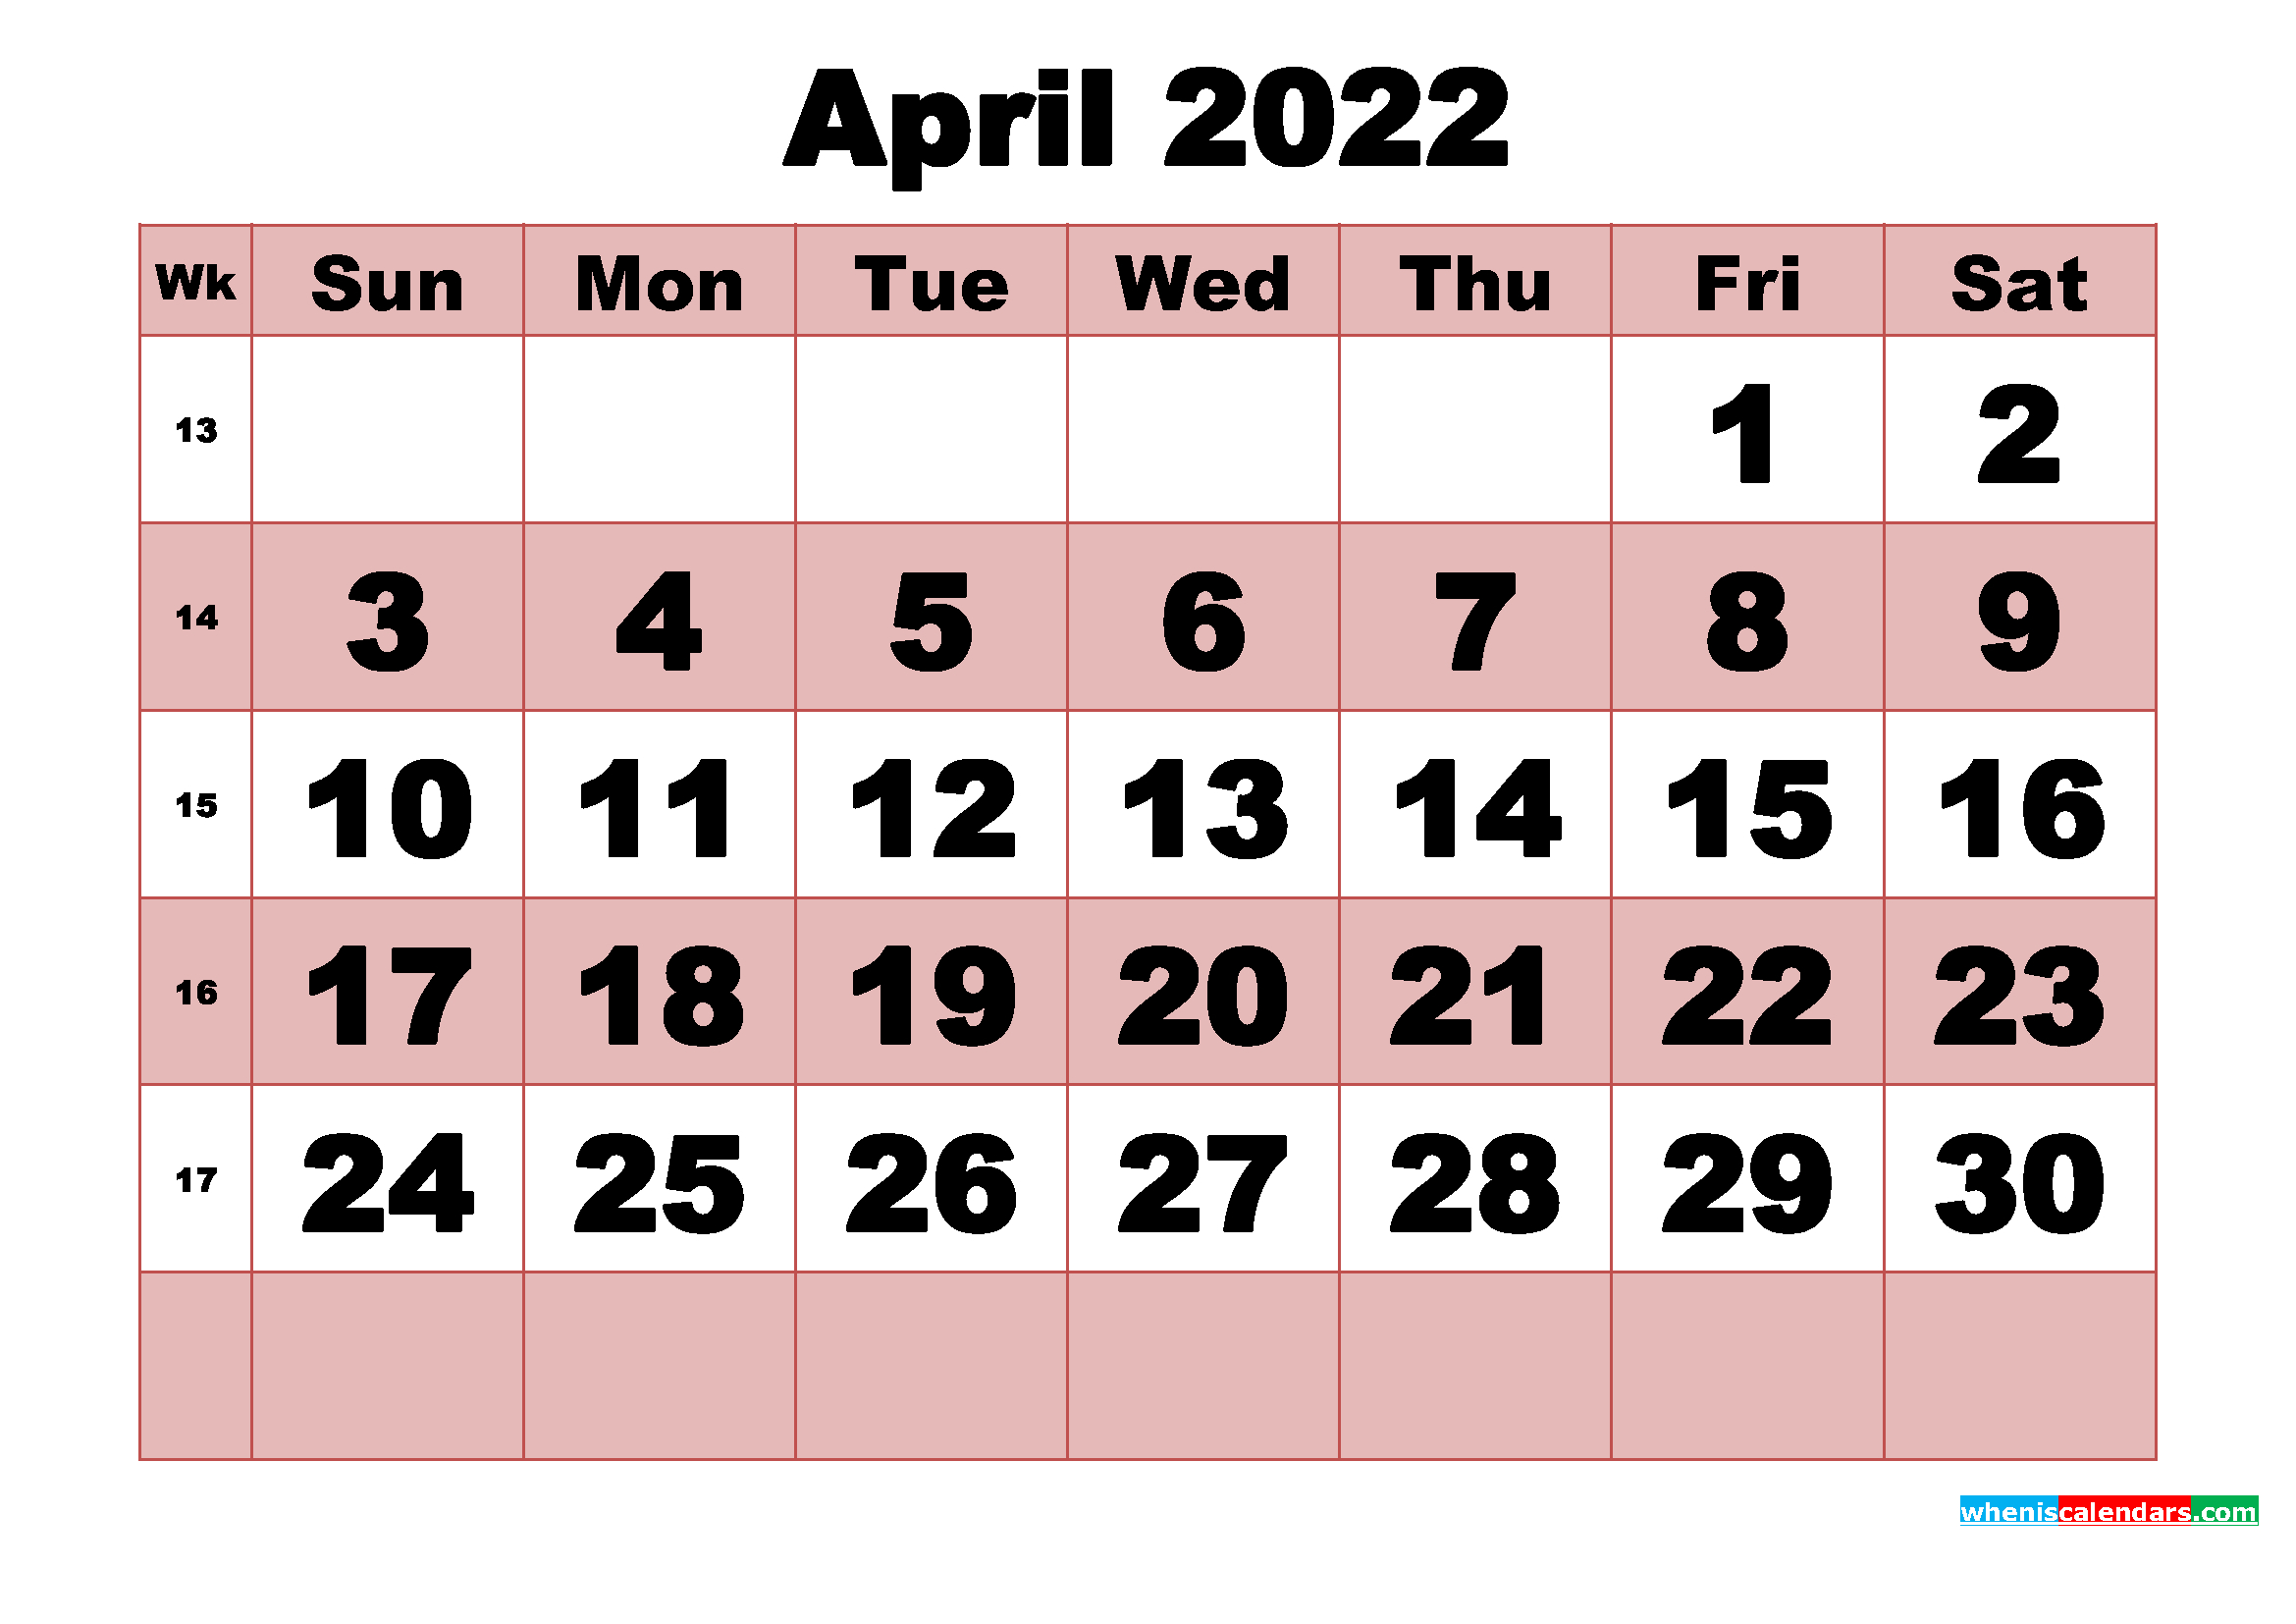 Free Printable Monthly Calendar April 2022 within Print Calendar April 2022 Photo